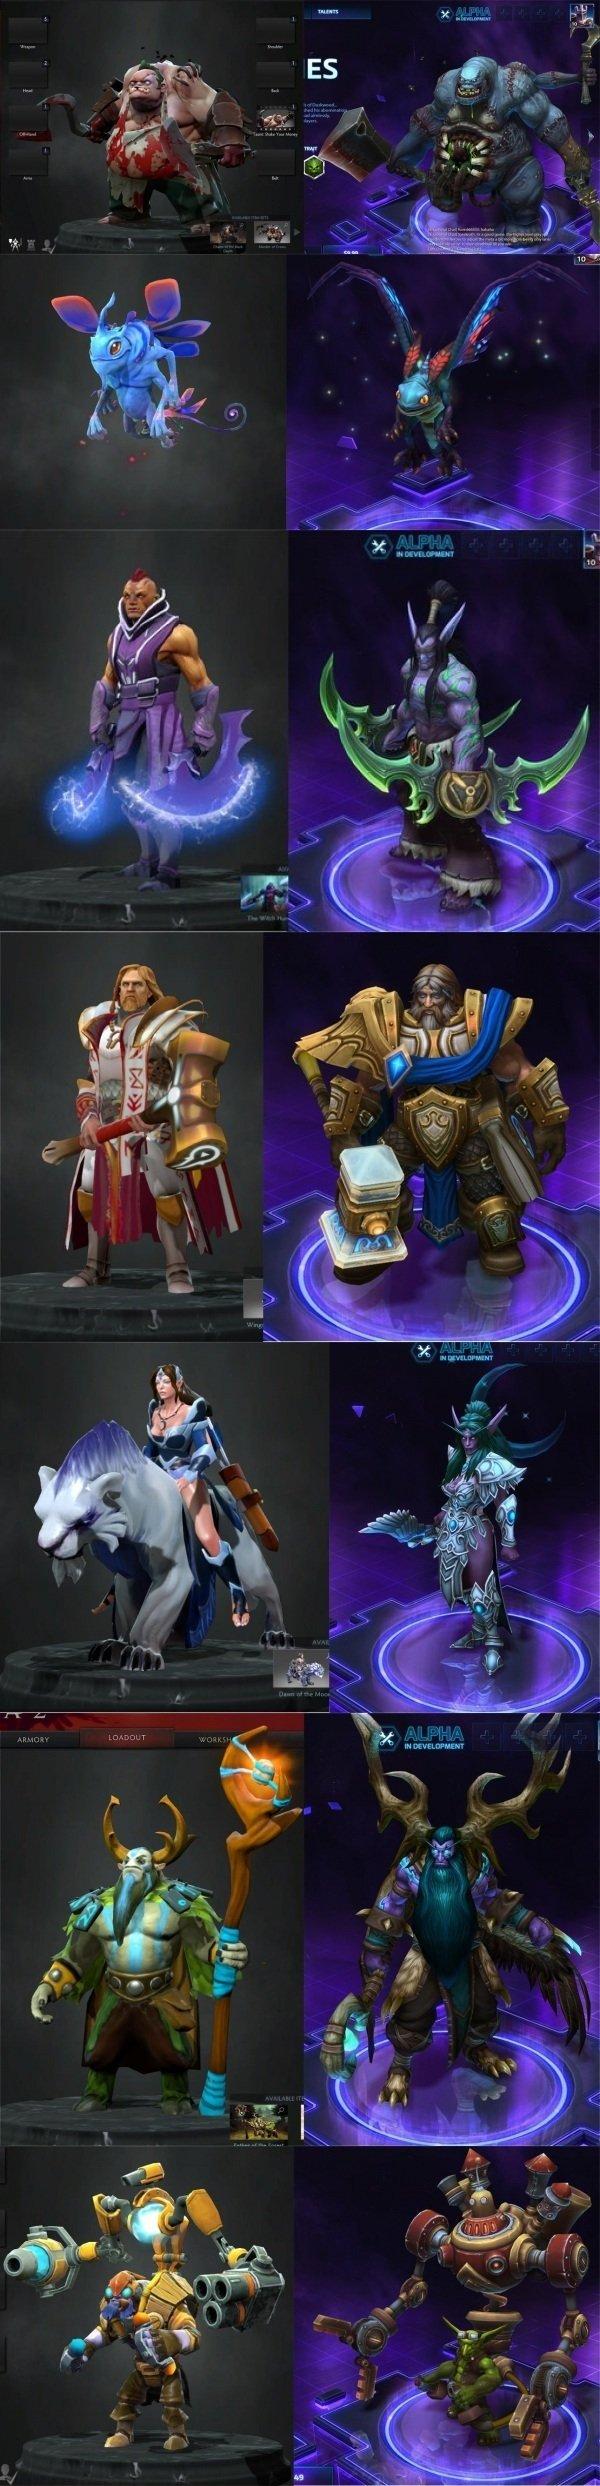 Valve - Blizzard - Изображение 1